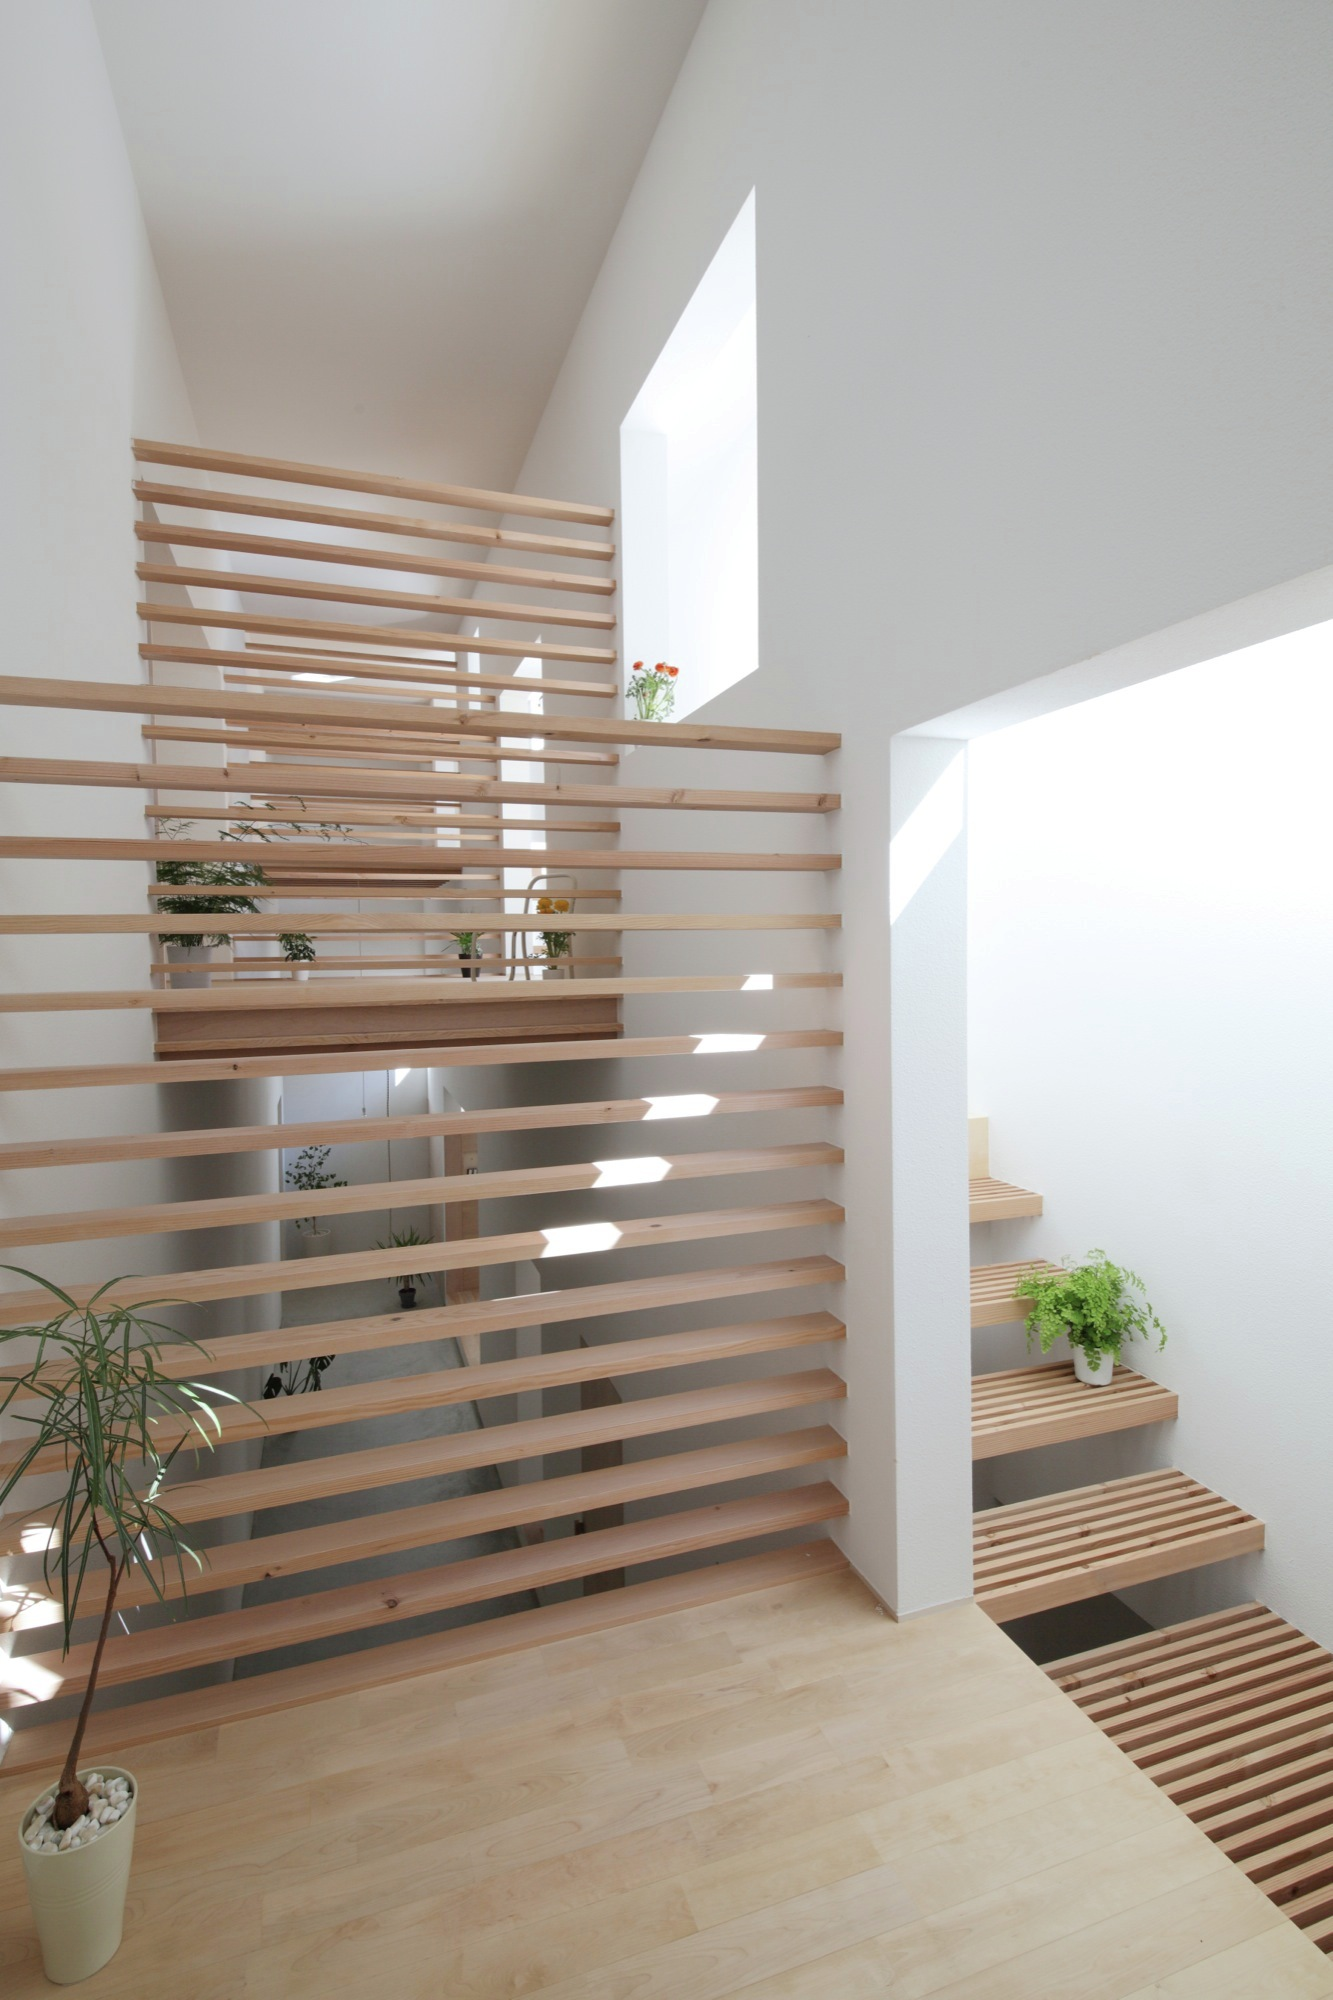 gallery of house in yamanote katsutoshi sasaki associates 3. Black Bedroom Furniture Sets. Home Design Ideas